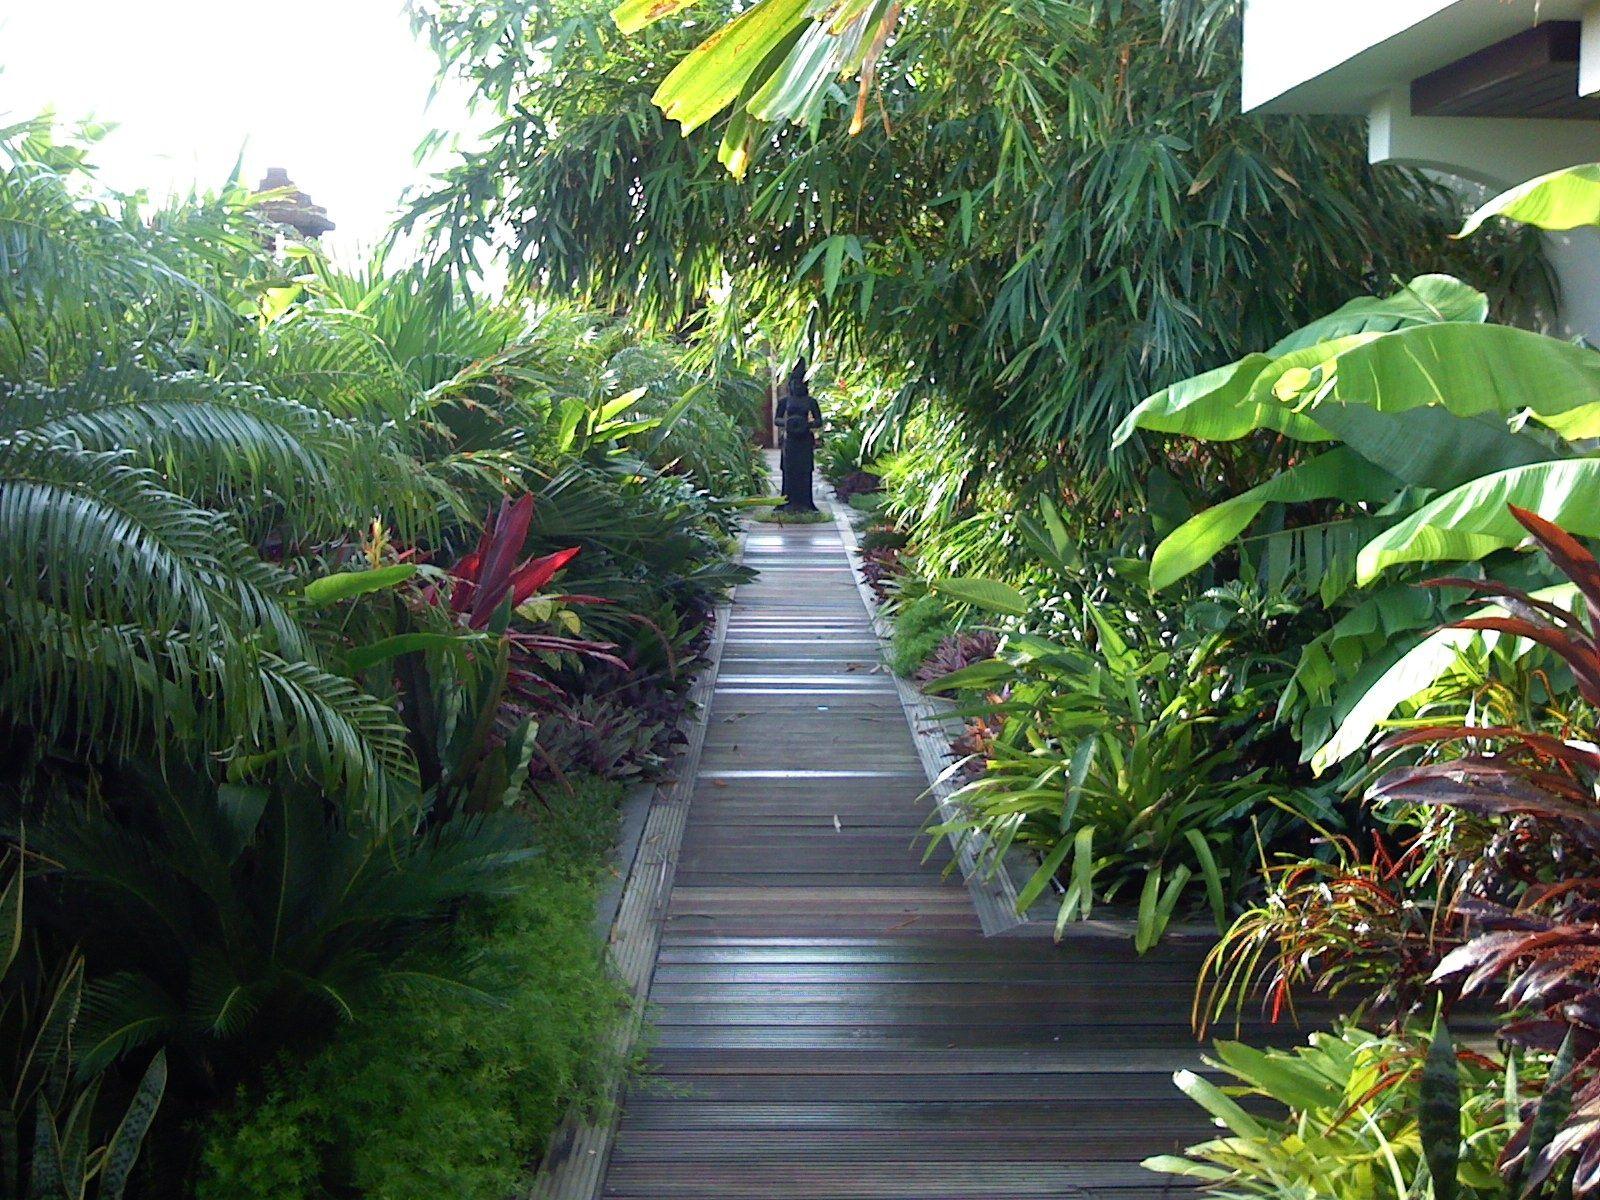 baoase resort curacao. landscaping